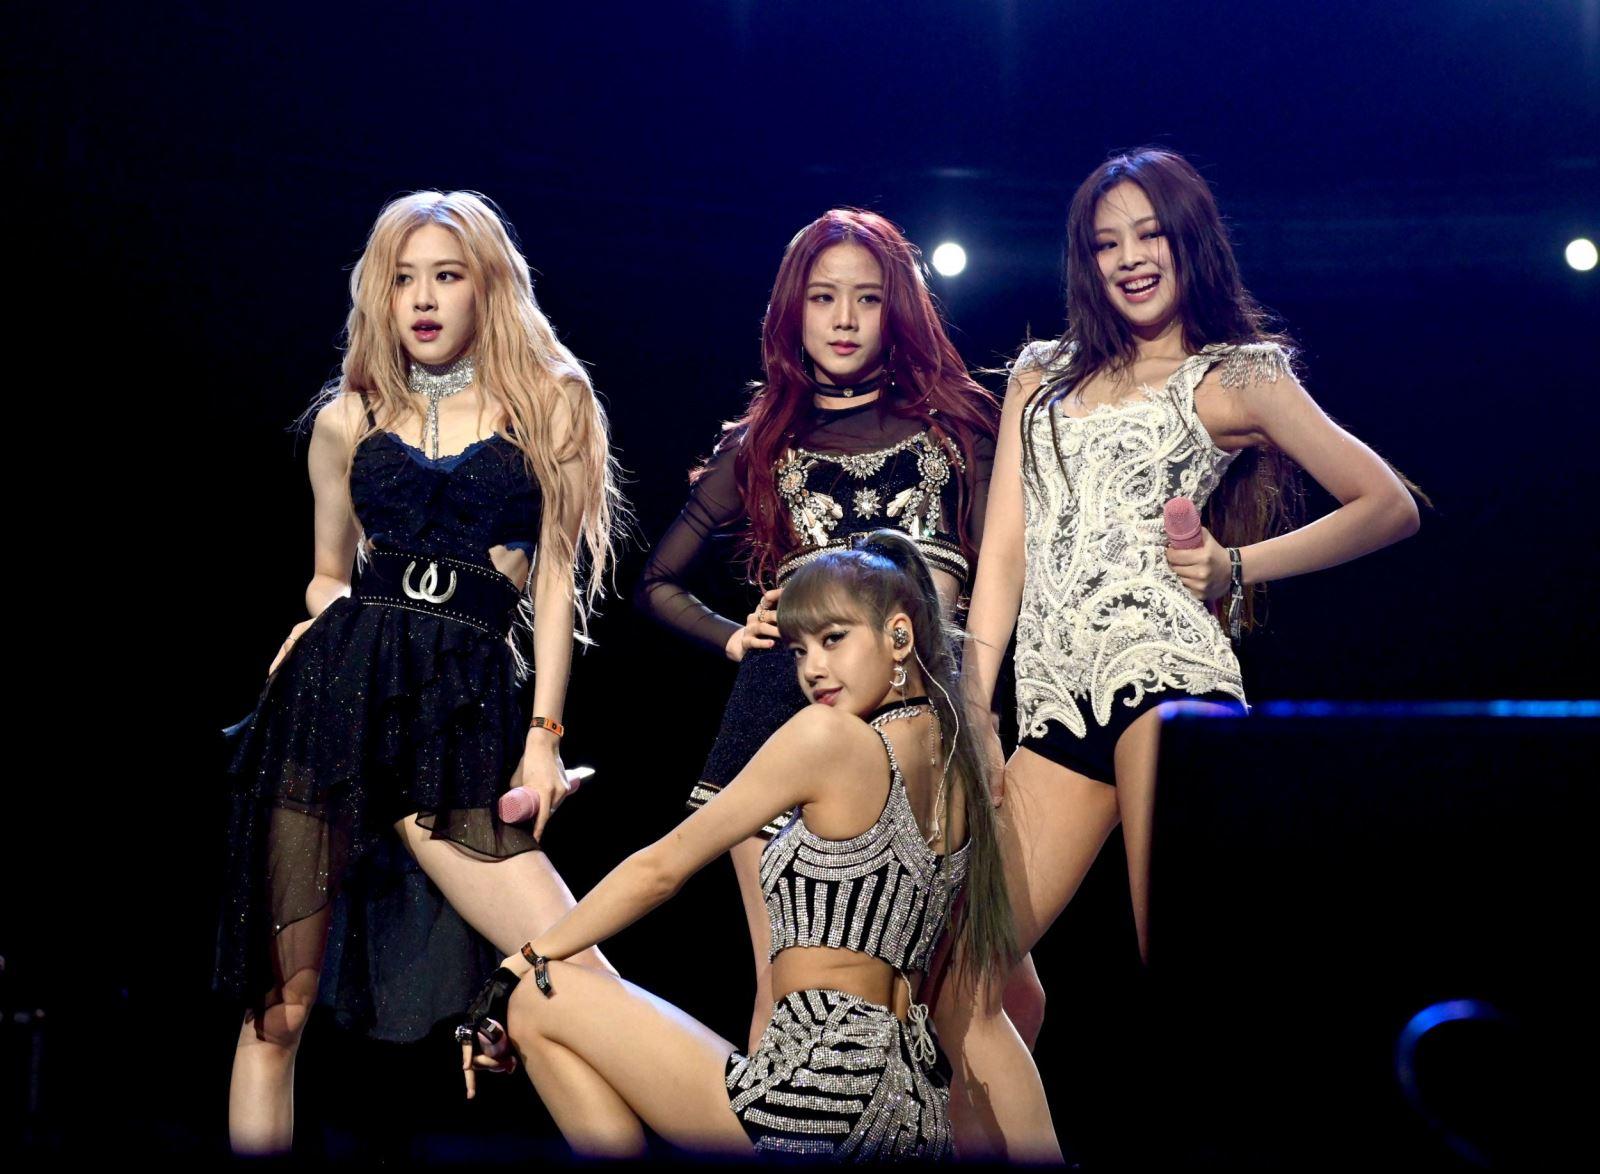 Blackpink, Jennie, Rose, Lisa, Jisoo, Blackpink mặt mộc, Mặt mộc sao Blackpink, cách trang điểm của Blackpink, nhan sắc của Blackpink, vẻ đẹp của Blackpink